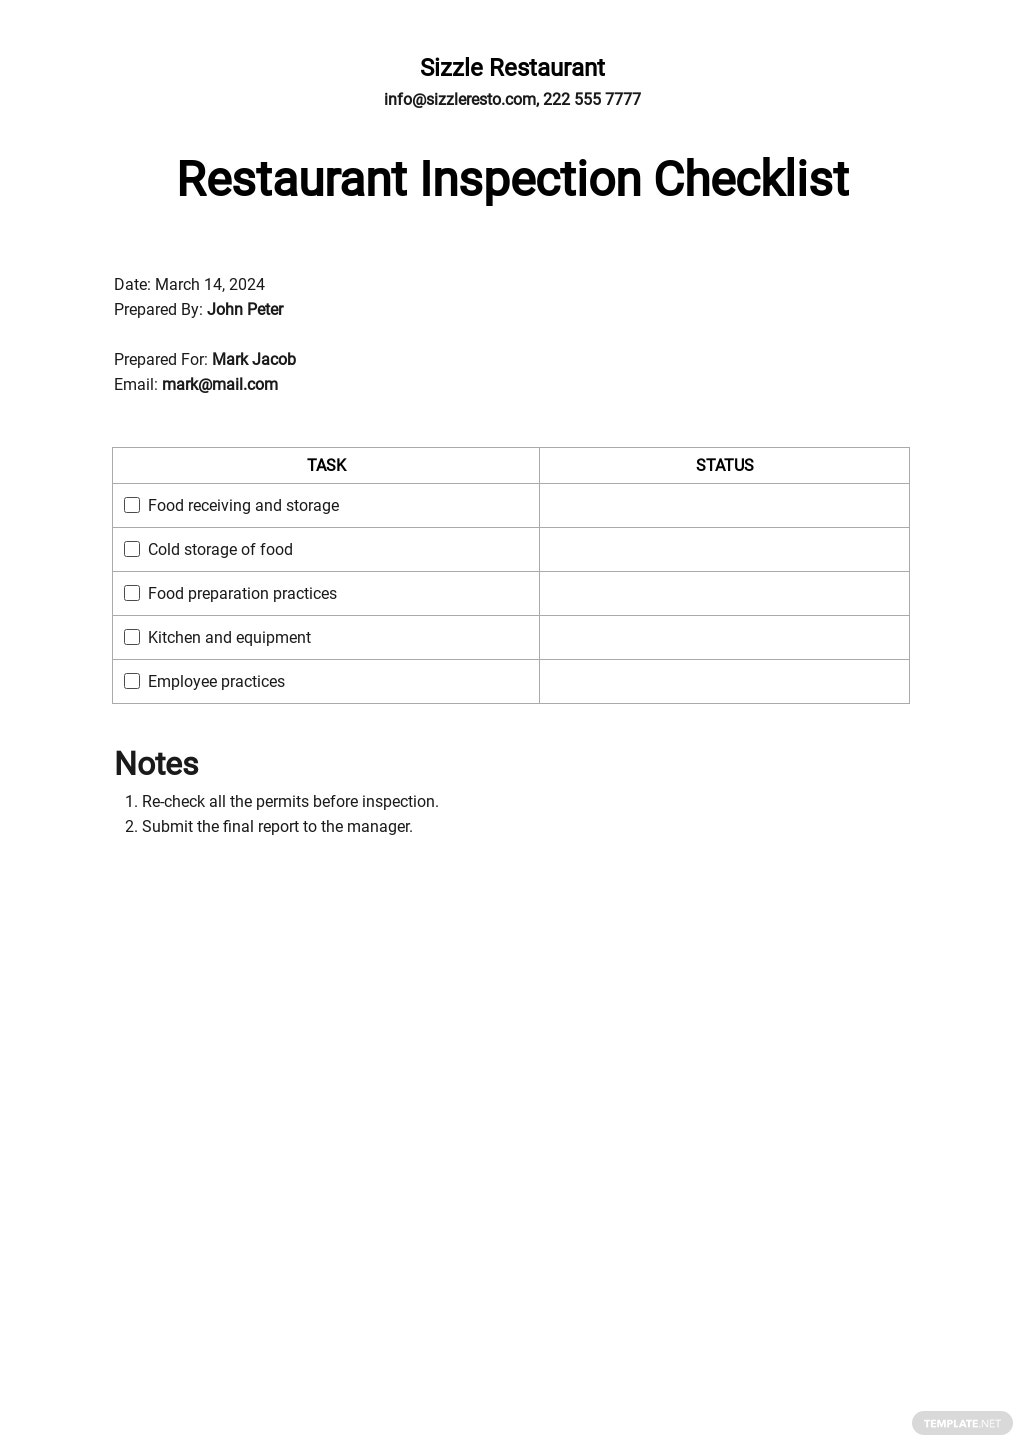 Restaurant Inspection Checklist Template